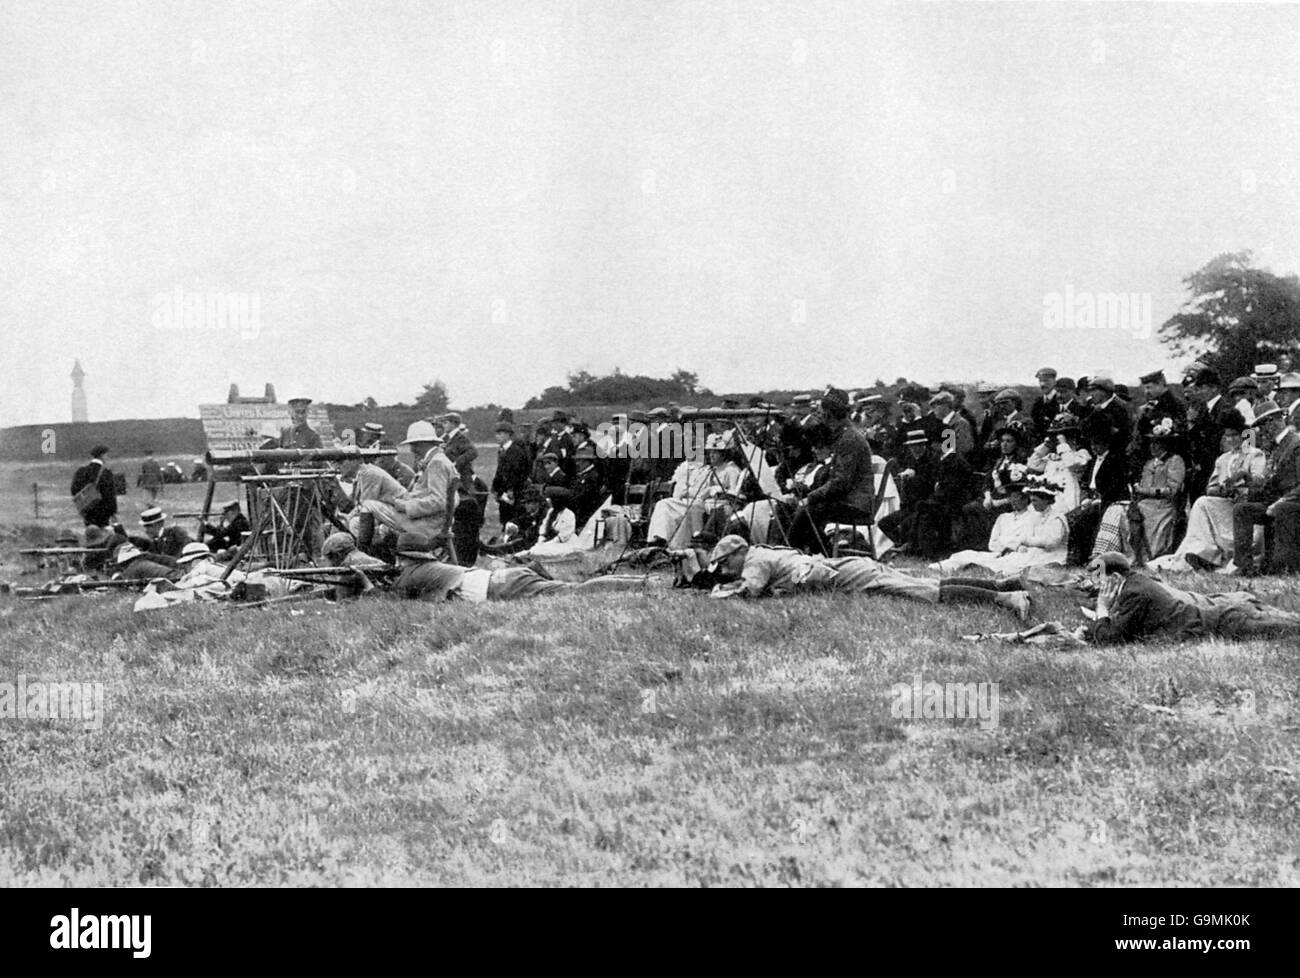 Shooting - London Olympic Games 1908 - Free Rifle - Bisley - Stock Image